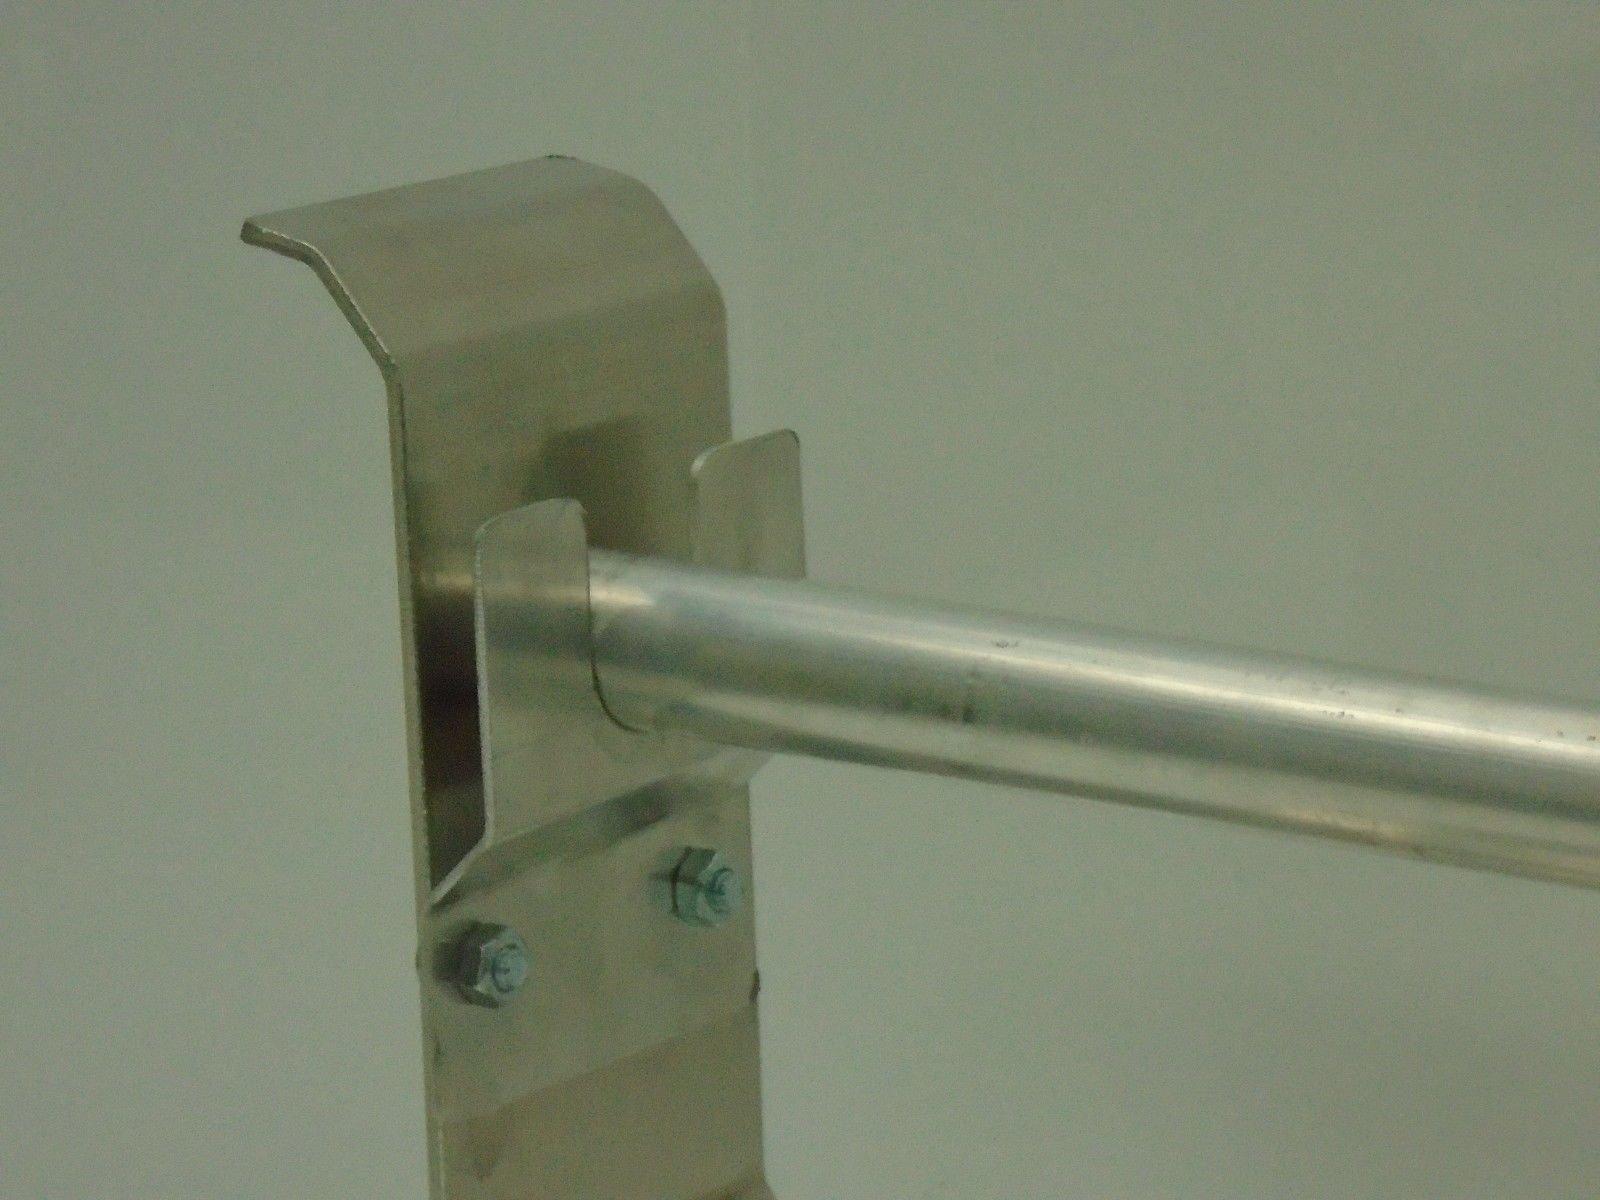 Paper Cutter Roll Dispenser Econoline 18 inches table mount Kraft paper Duralov by Duralov (Image #8)